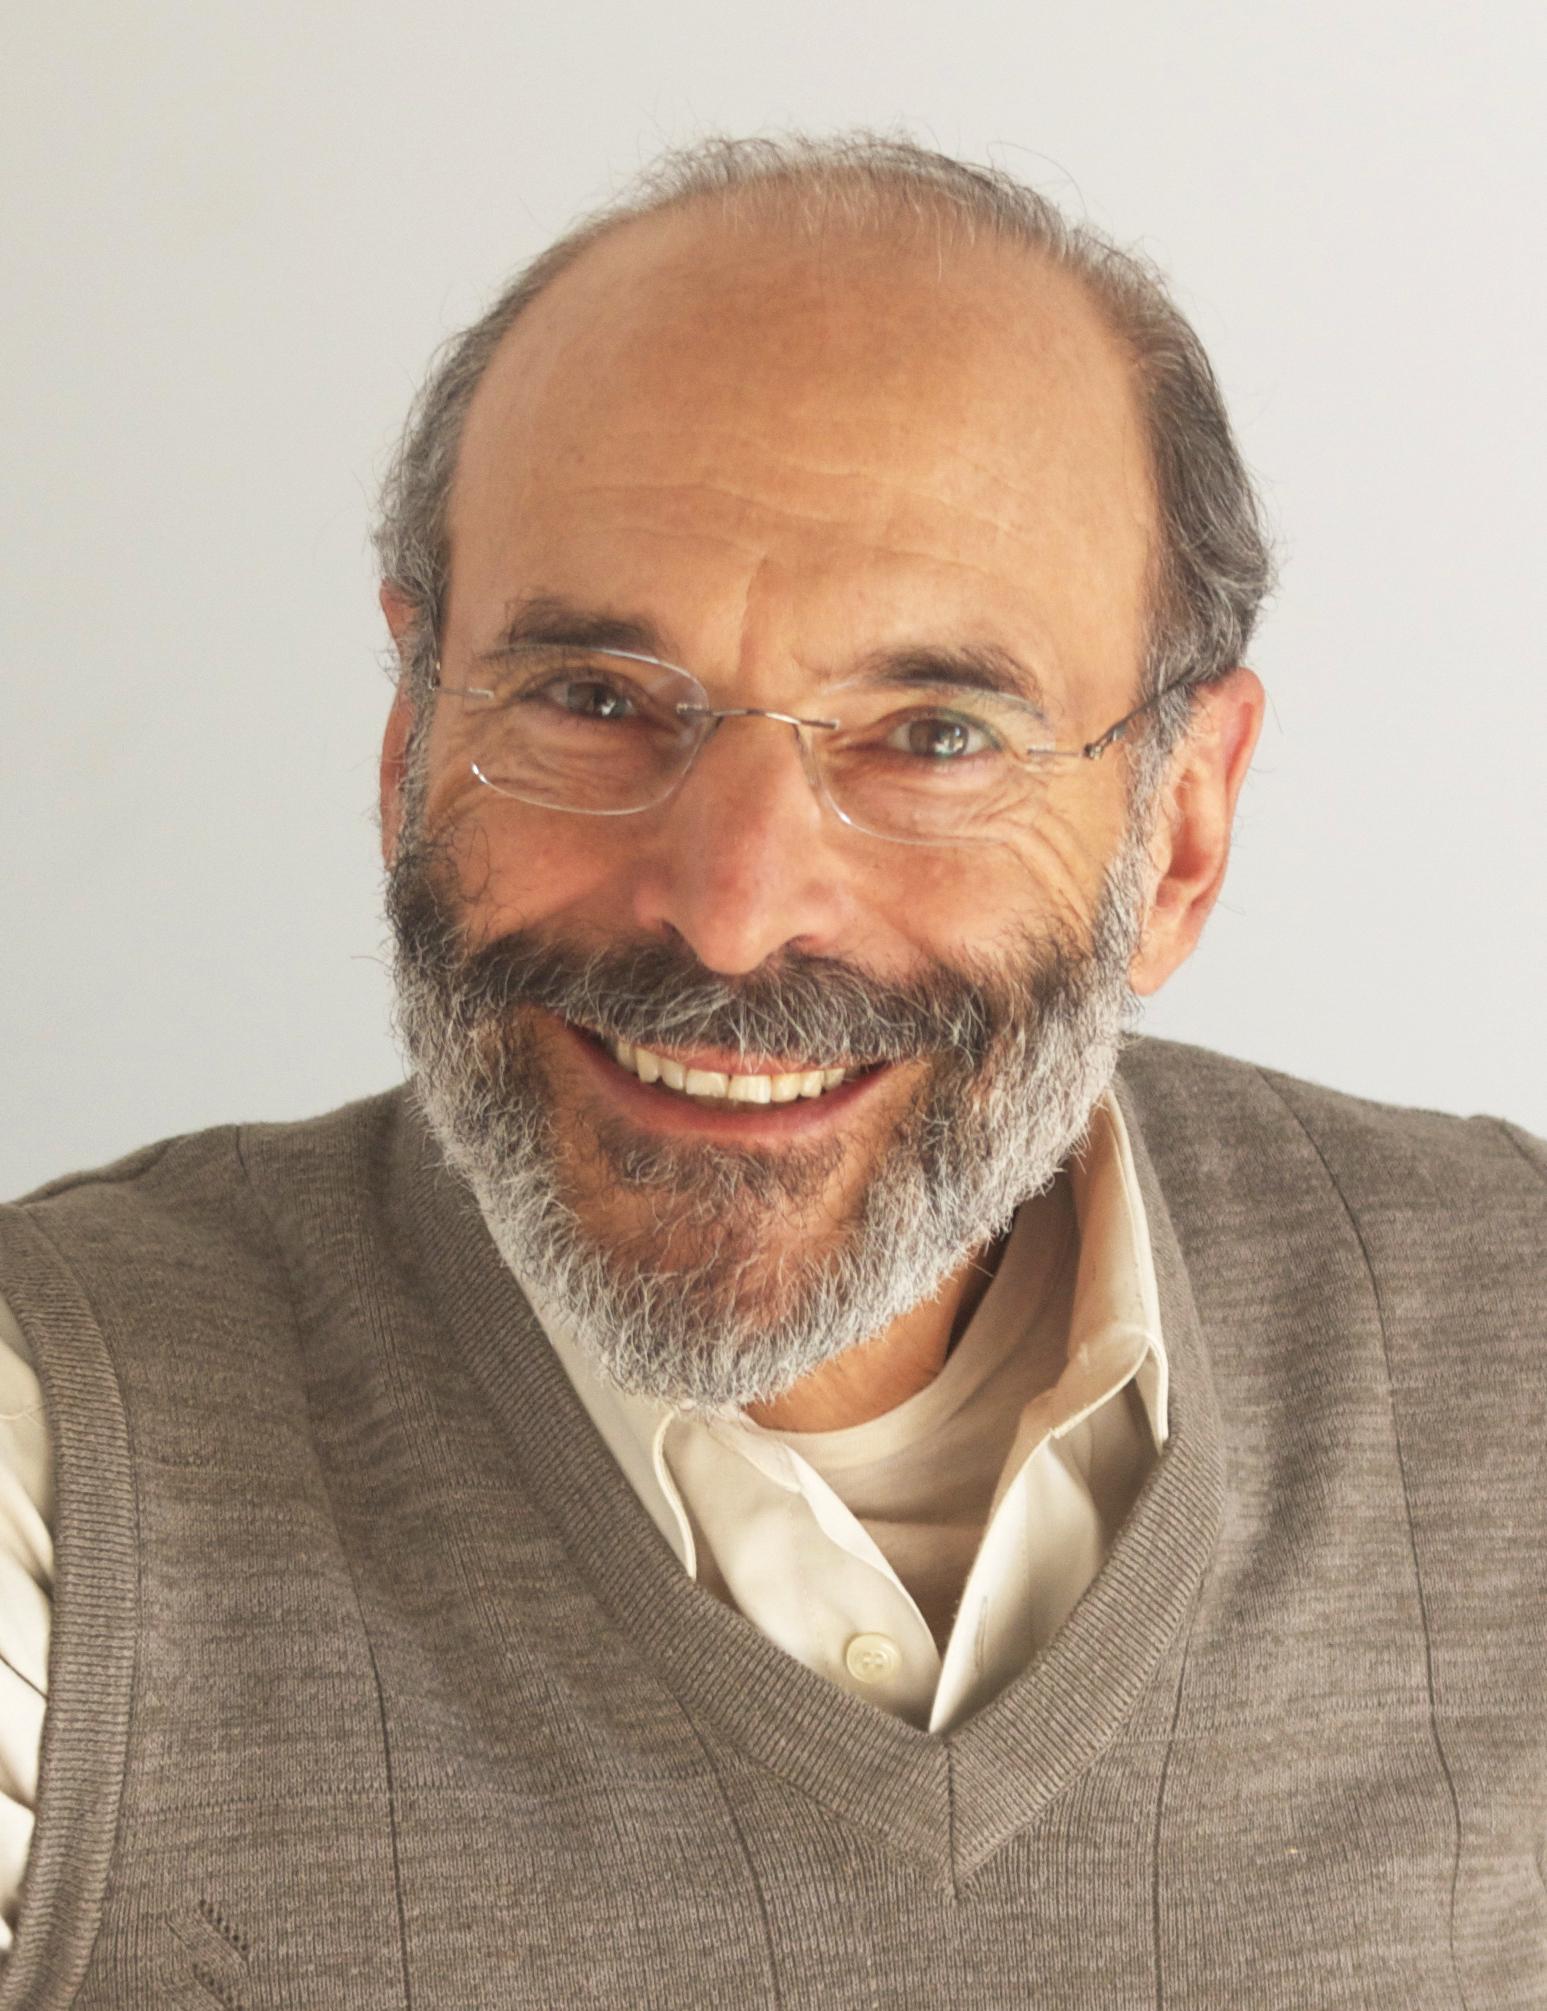 Dr. Alan M. Dattner